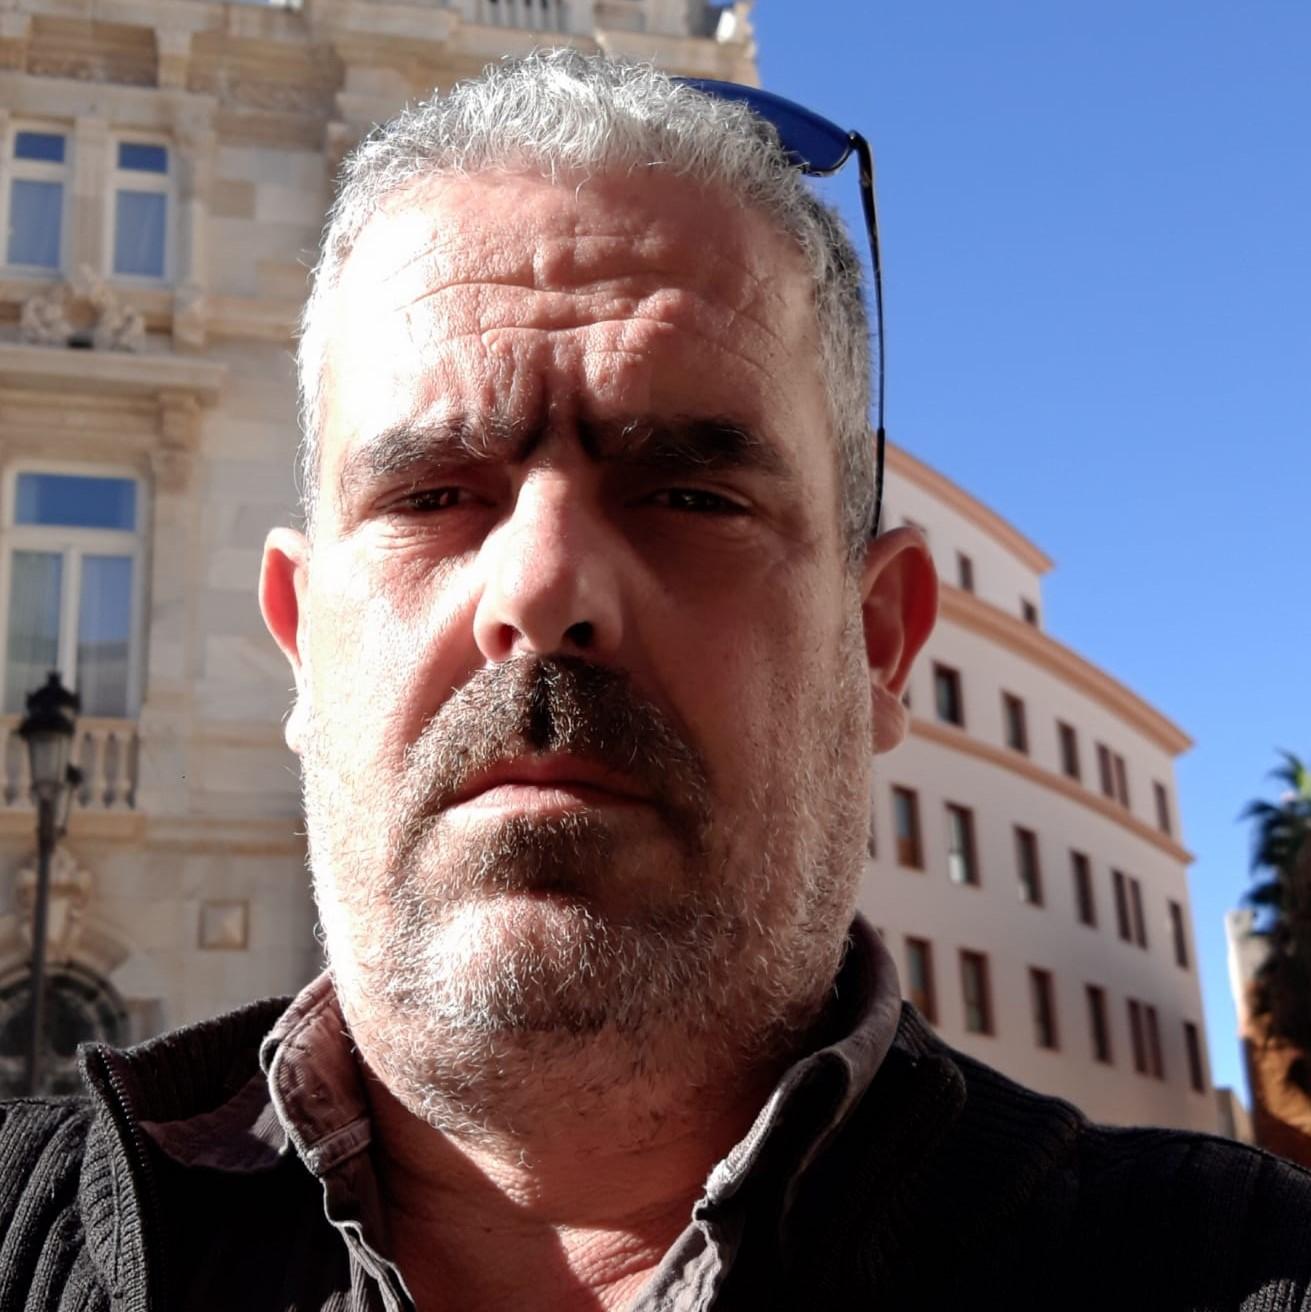 Ignacio González Rodríguez